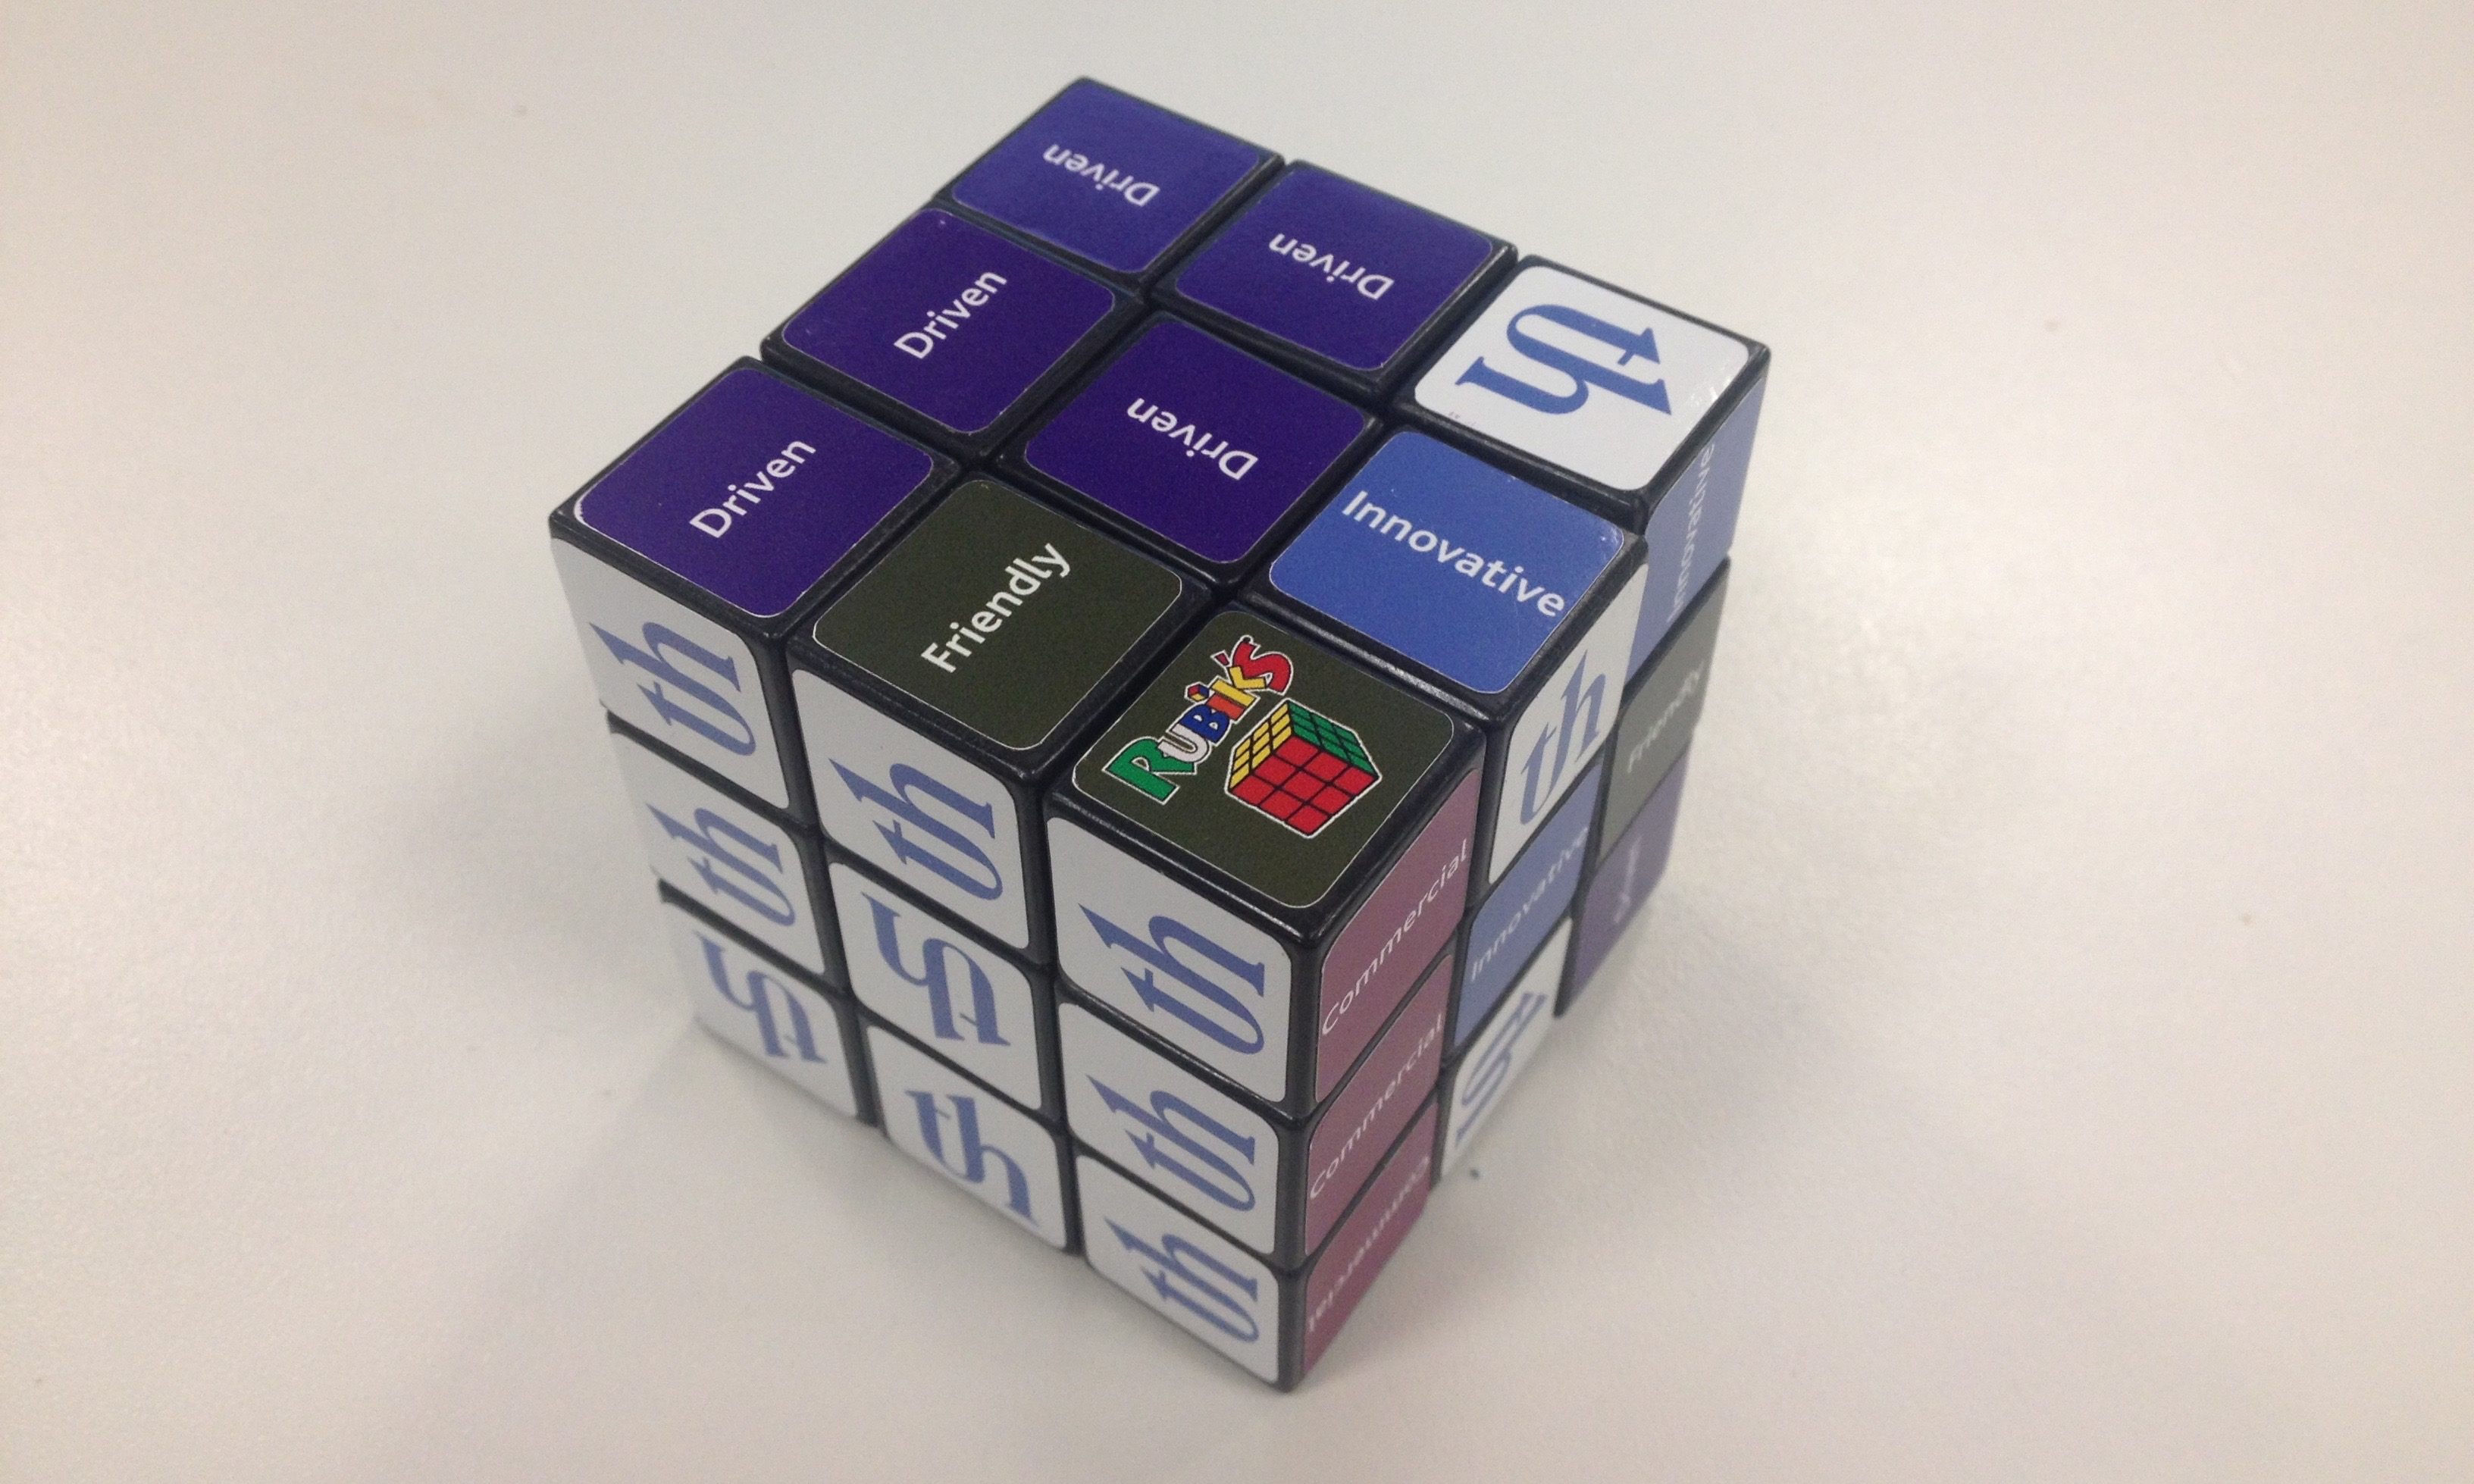 Trowers Rubik's Cube